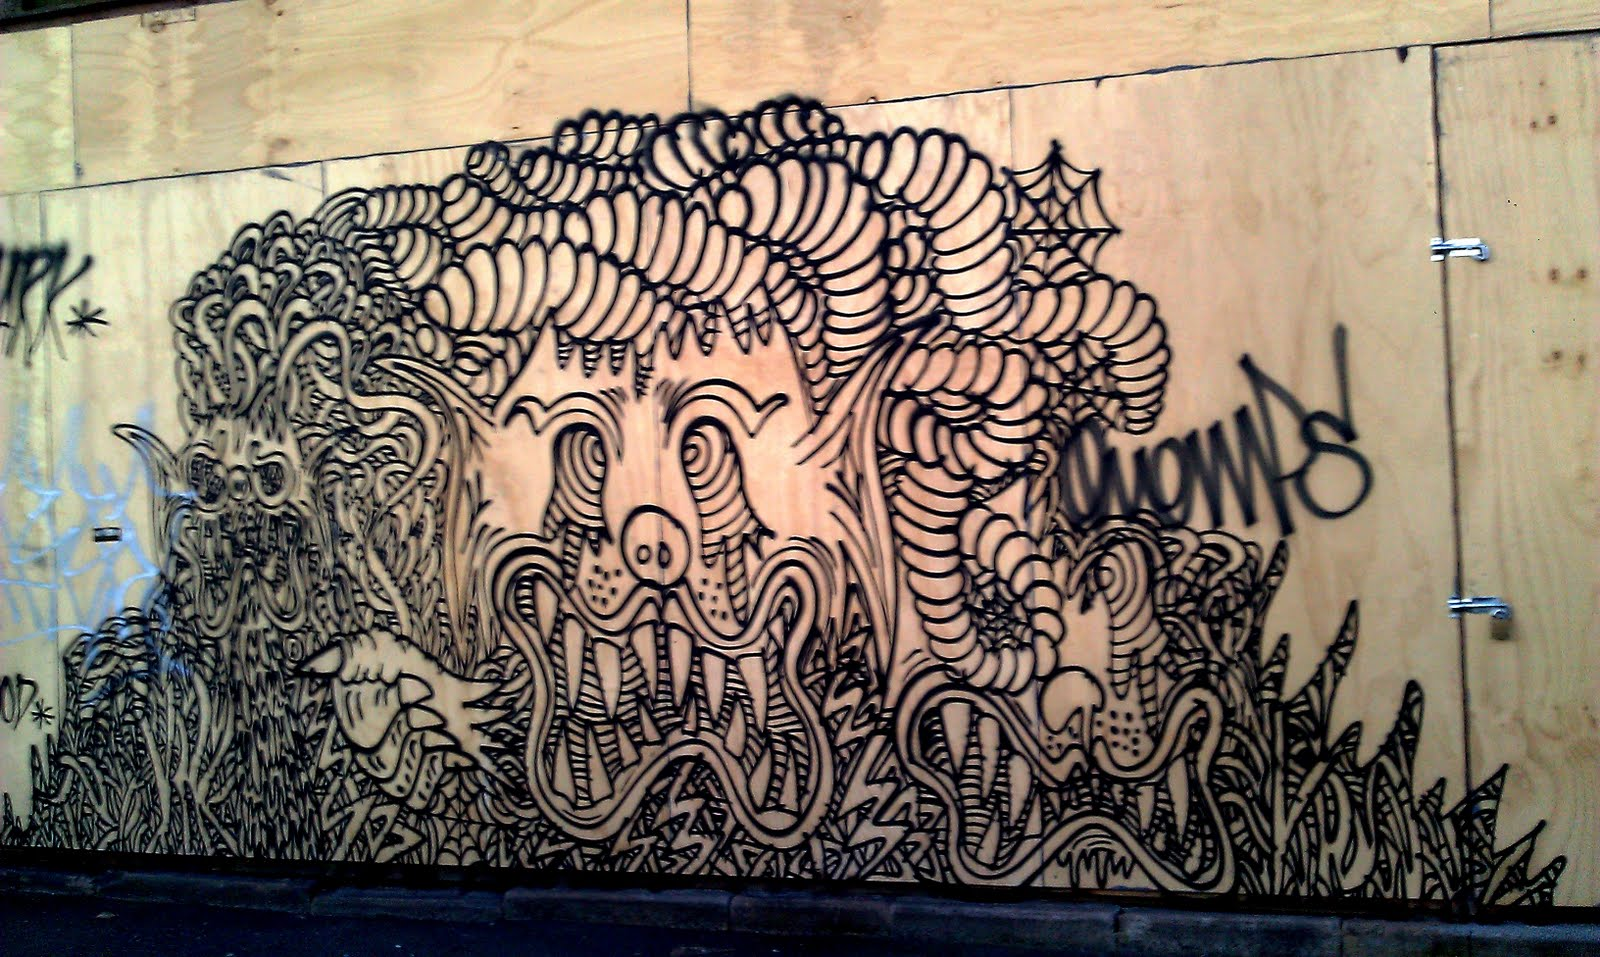 Slug graffiti